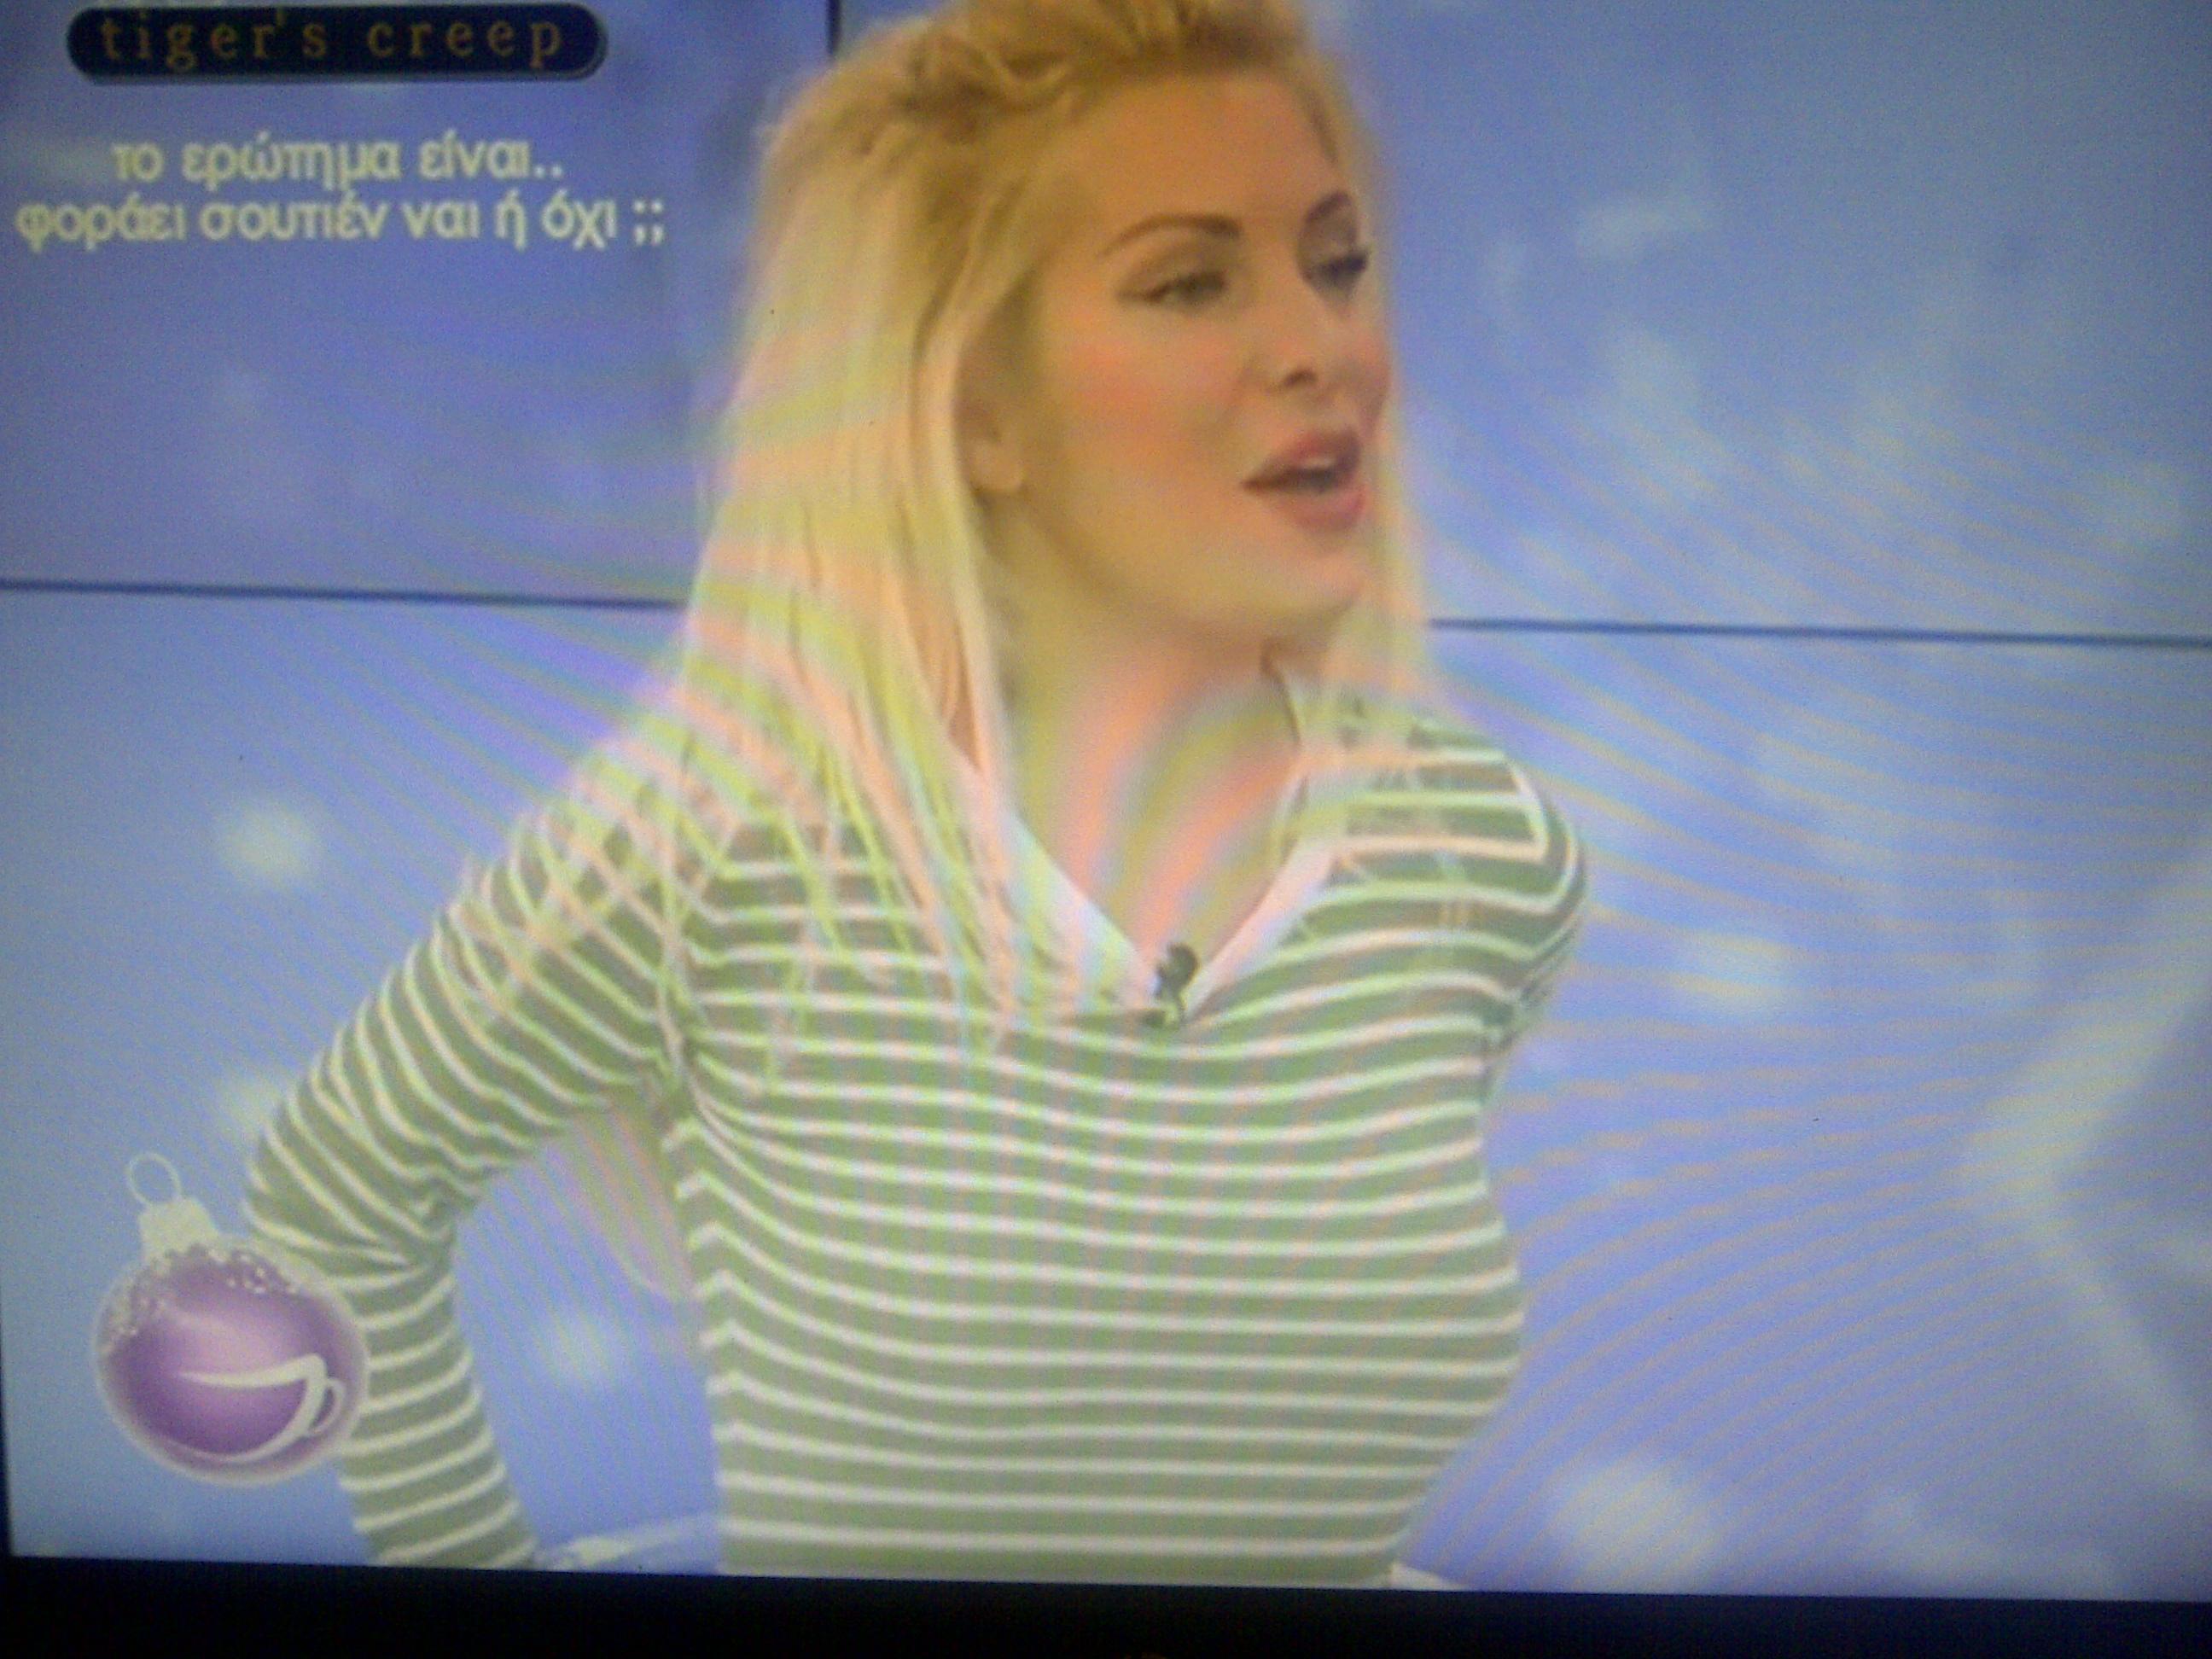 abd6be393187 Video  Η Ελένη Μενεγάκη ξέχασε να φορέσει σουτιέν στην εκπομπή!!!   Nassos  Blog